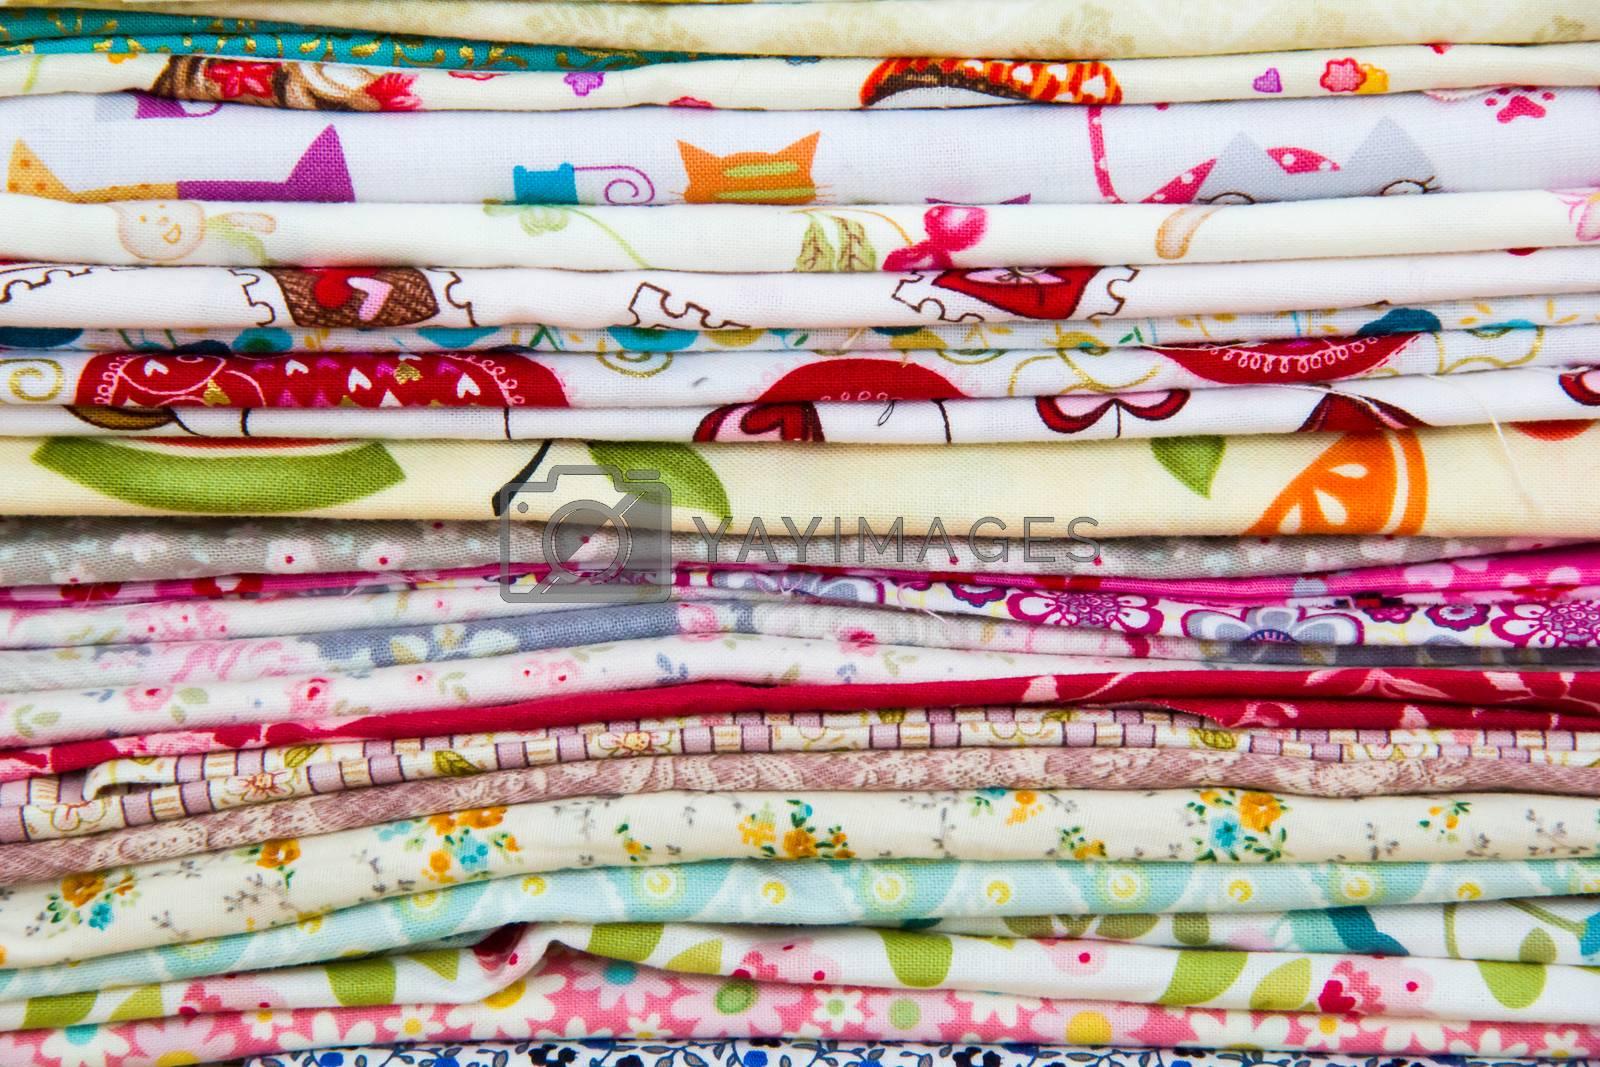 Royalty free image of fabric by Irinavk